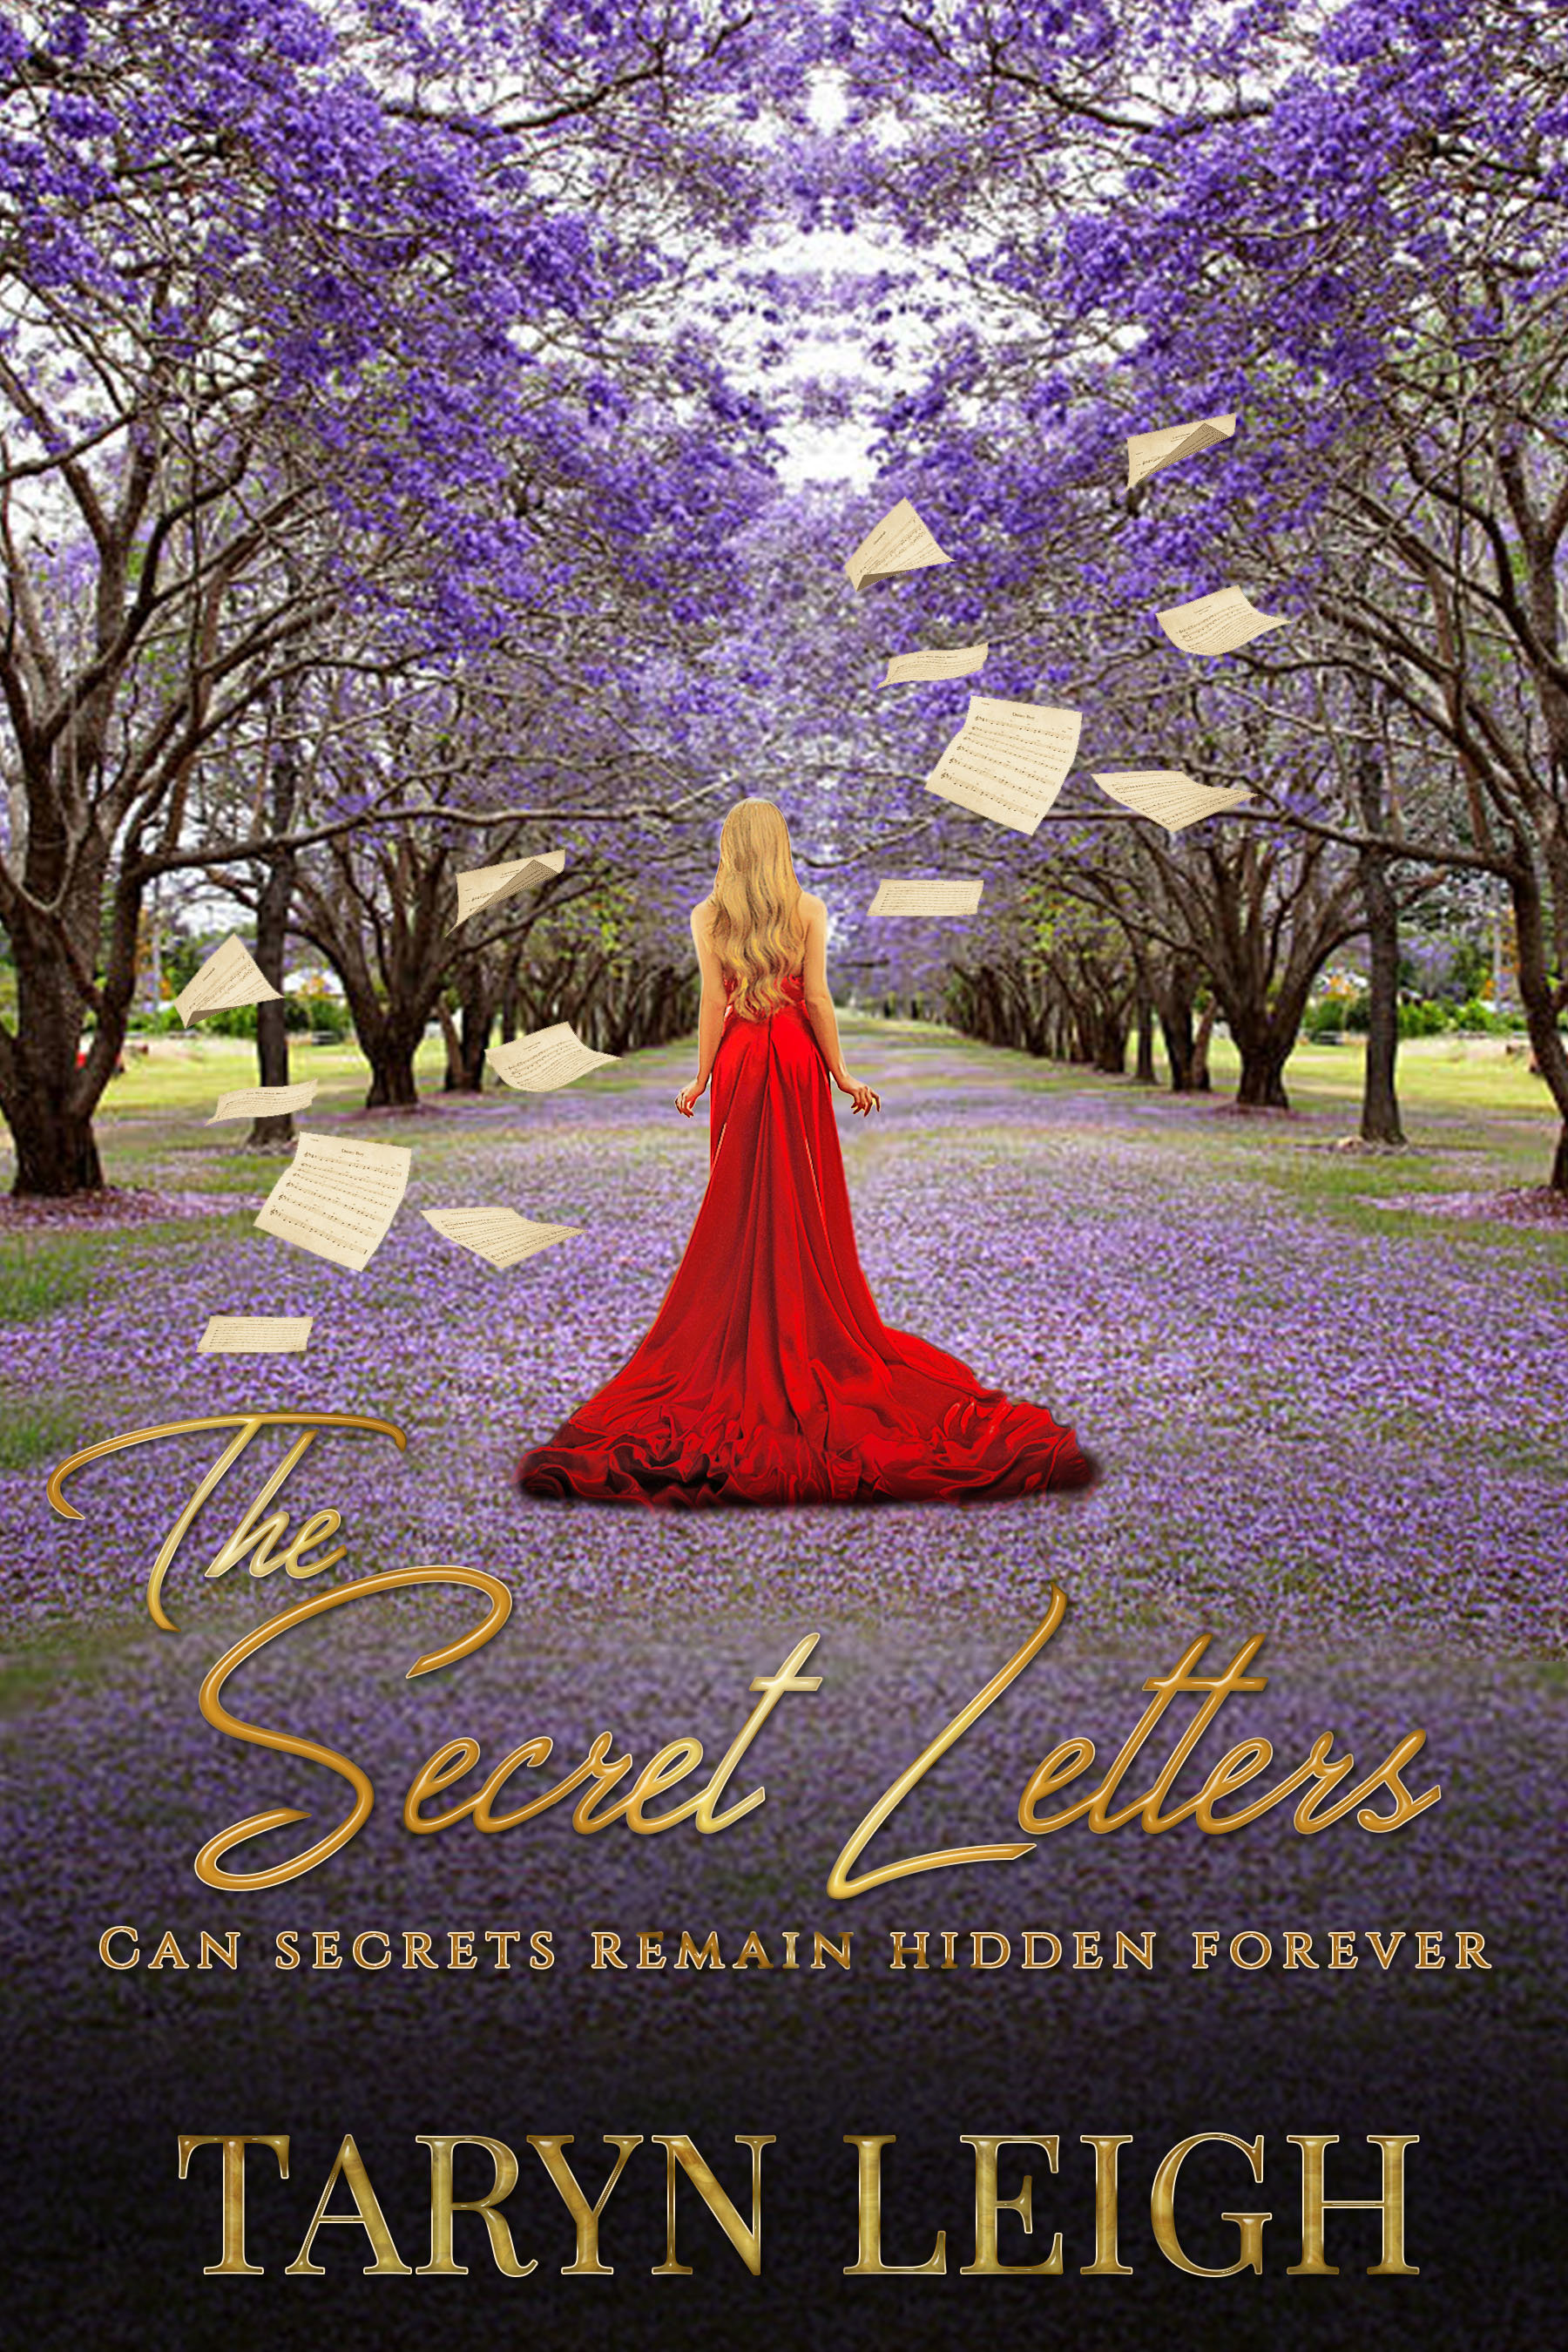 The Secret Letters Cover